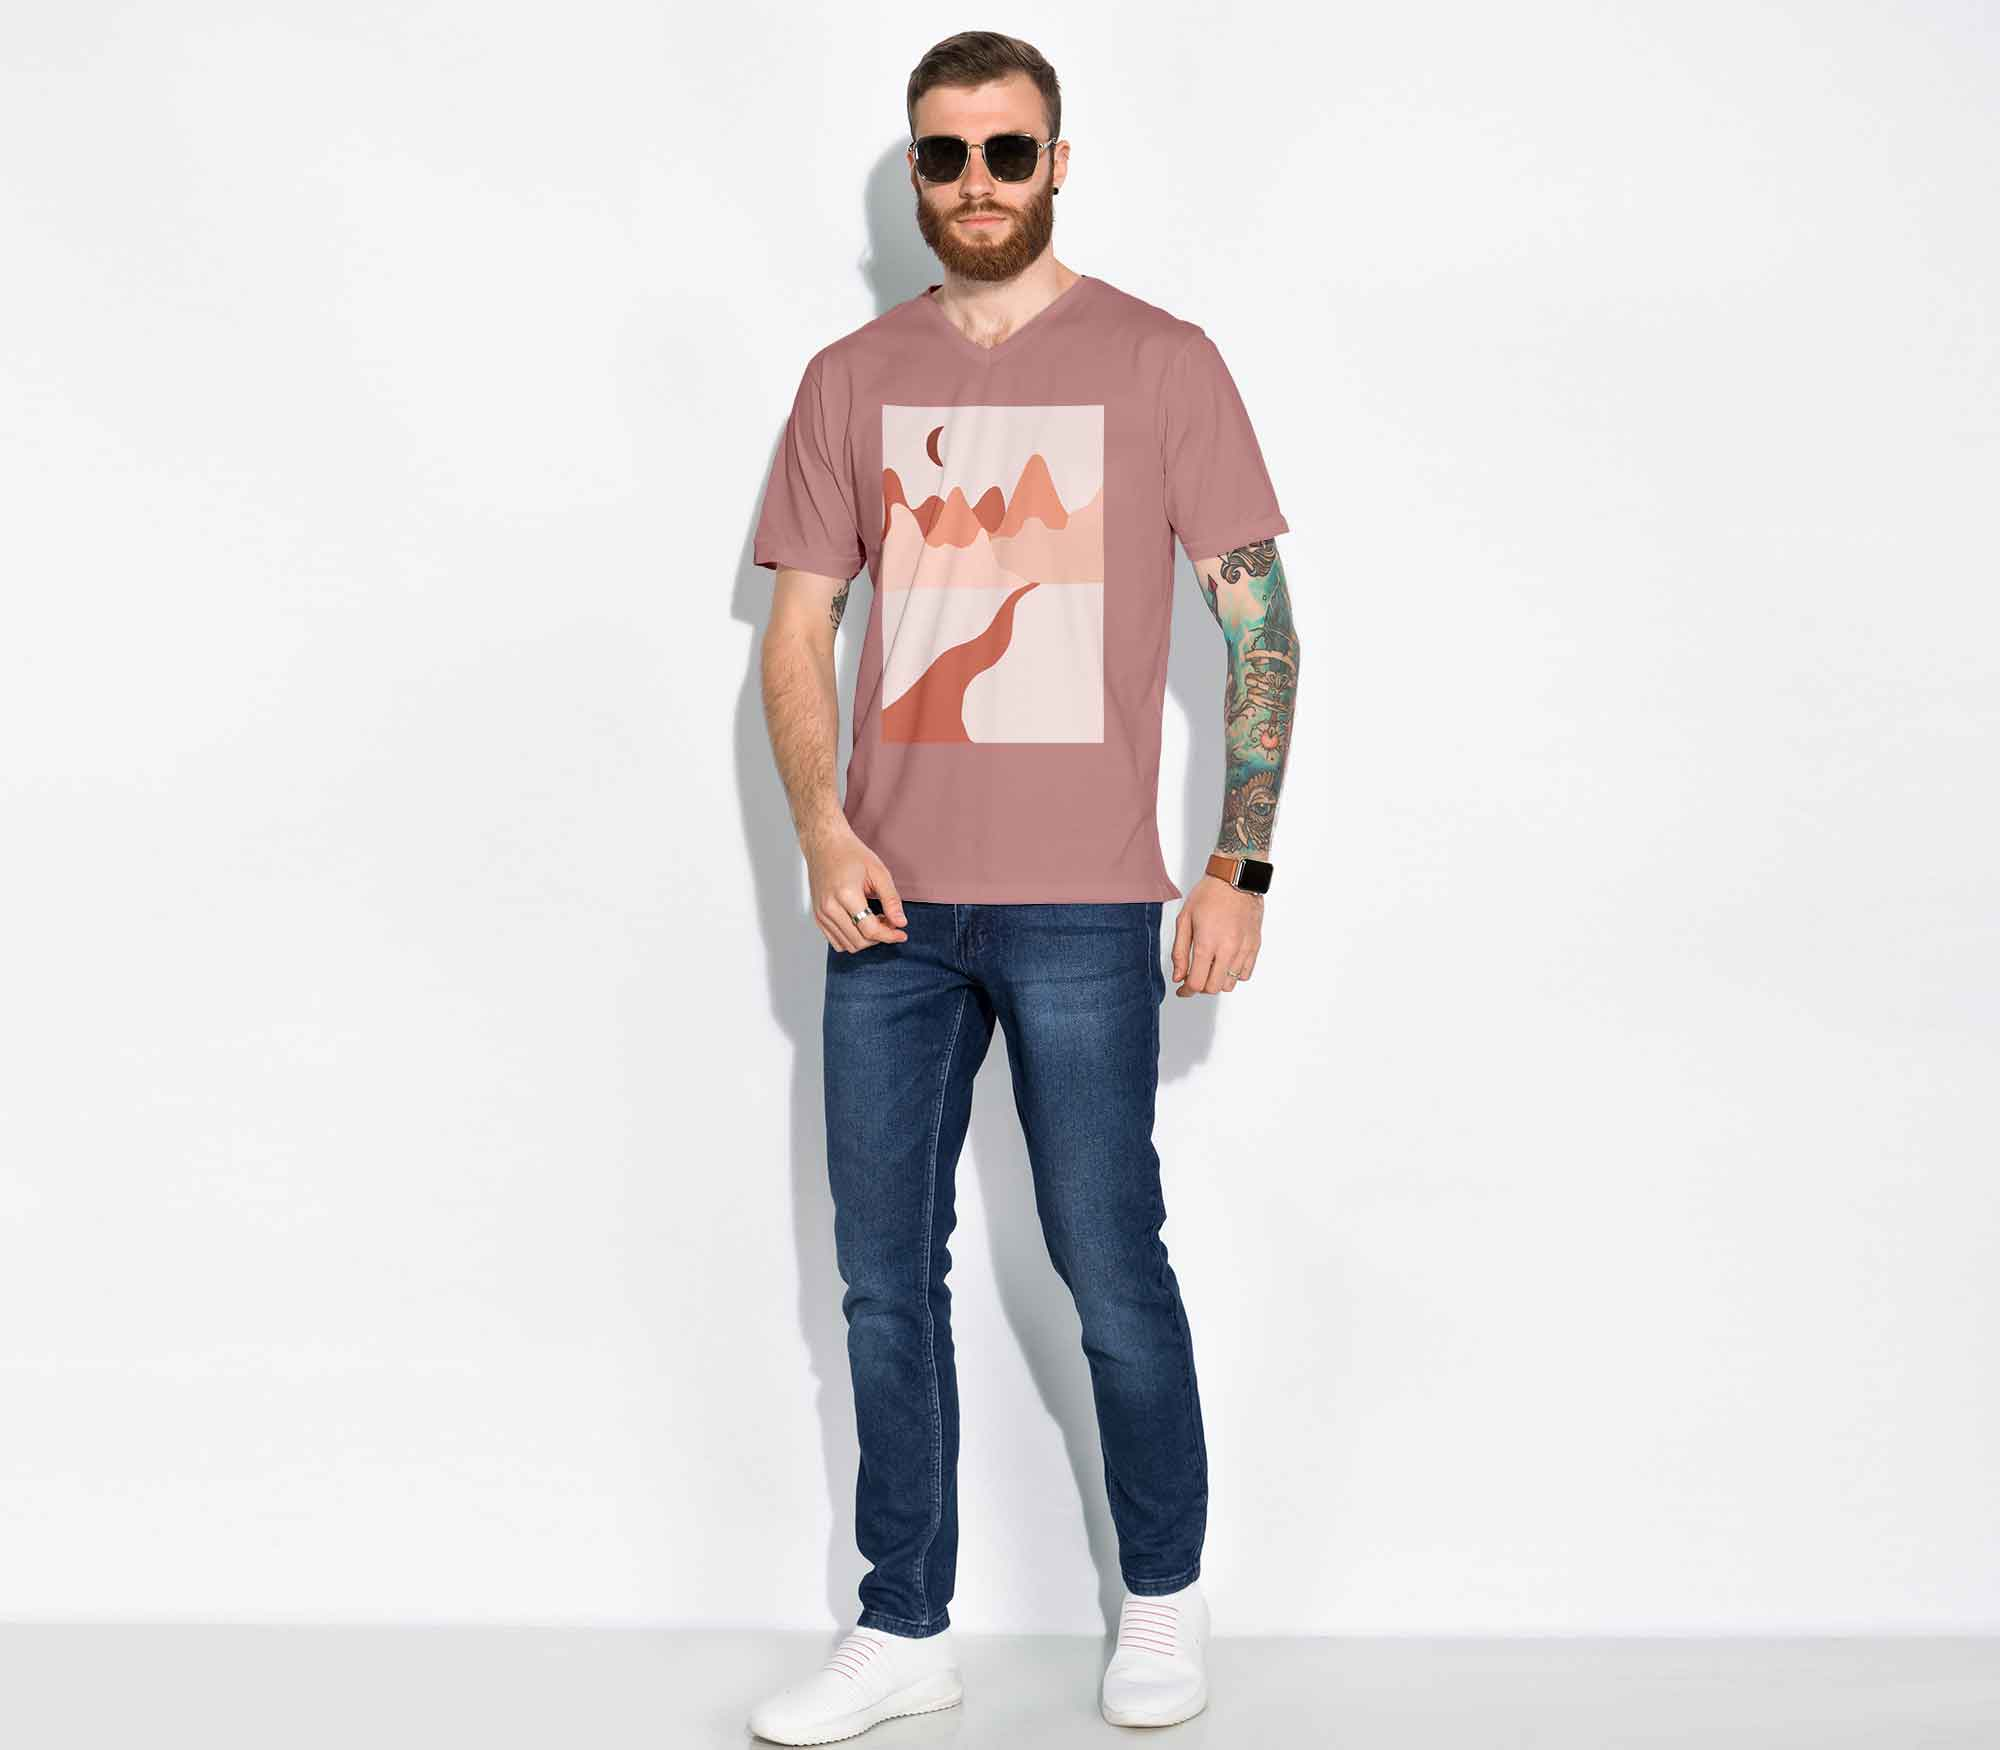 Male T-Shirt Fashion Mockup